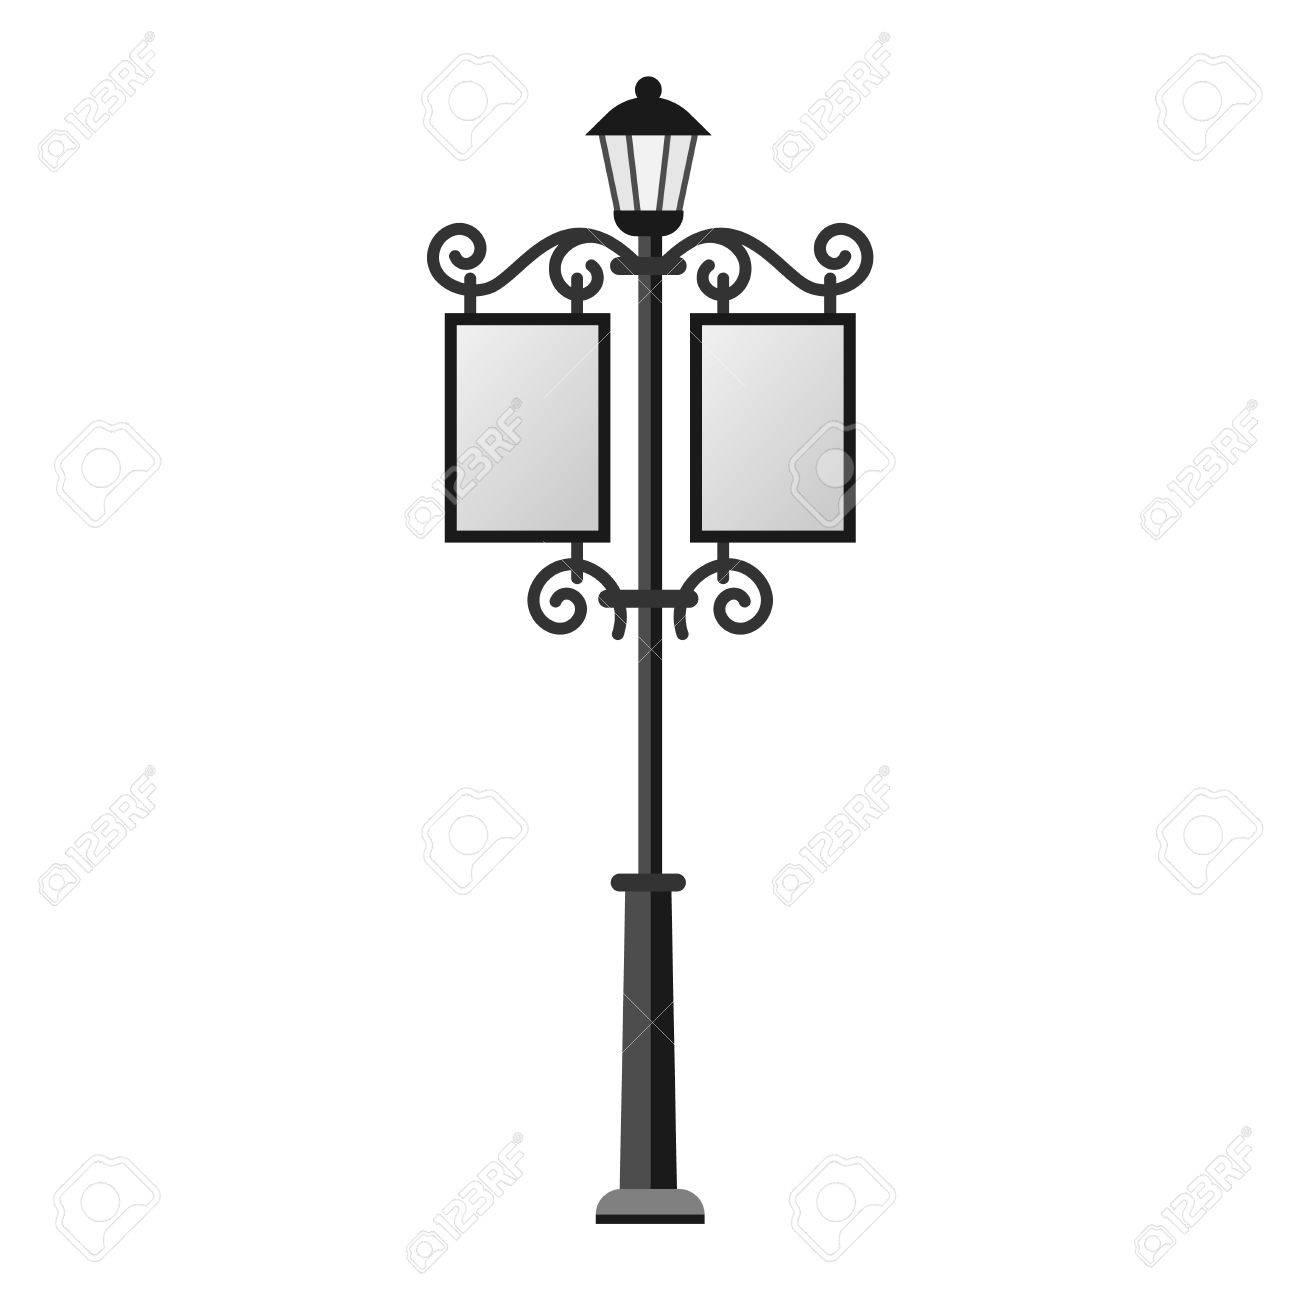 street lamp silhouette retro metal street object electricity